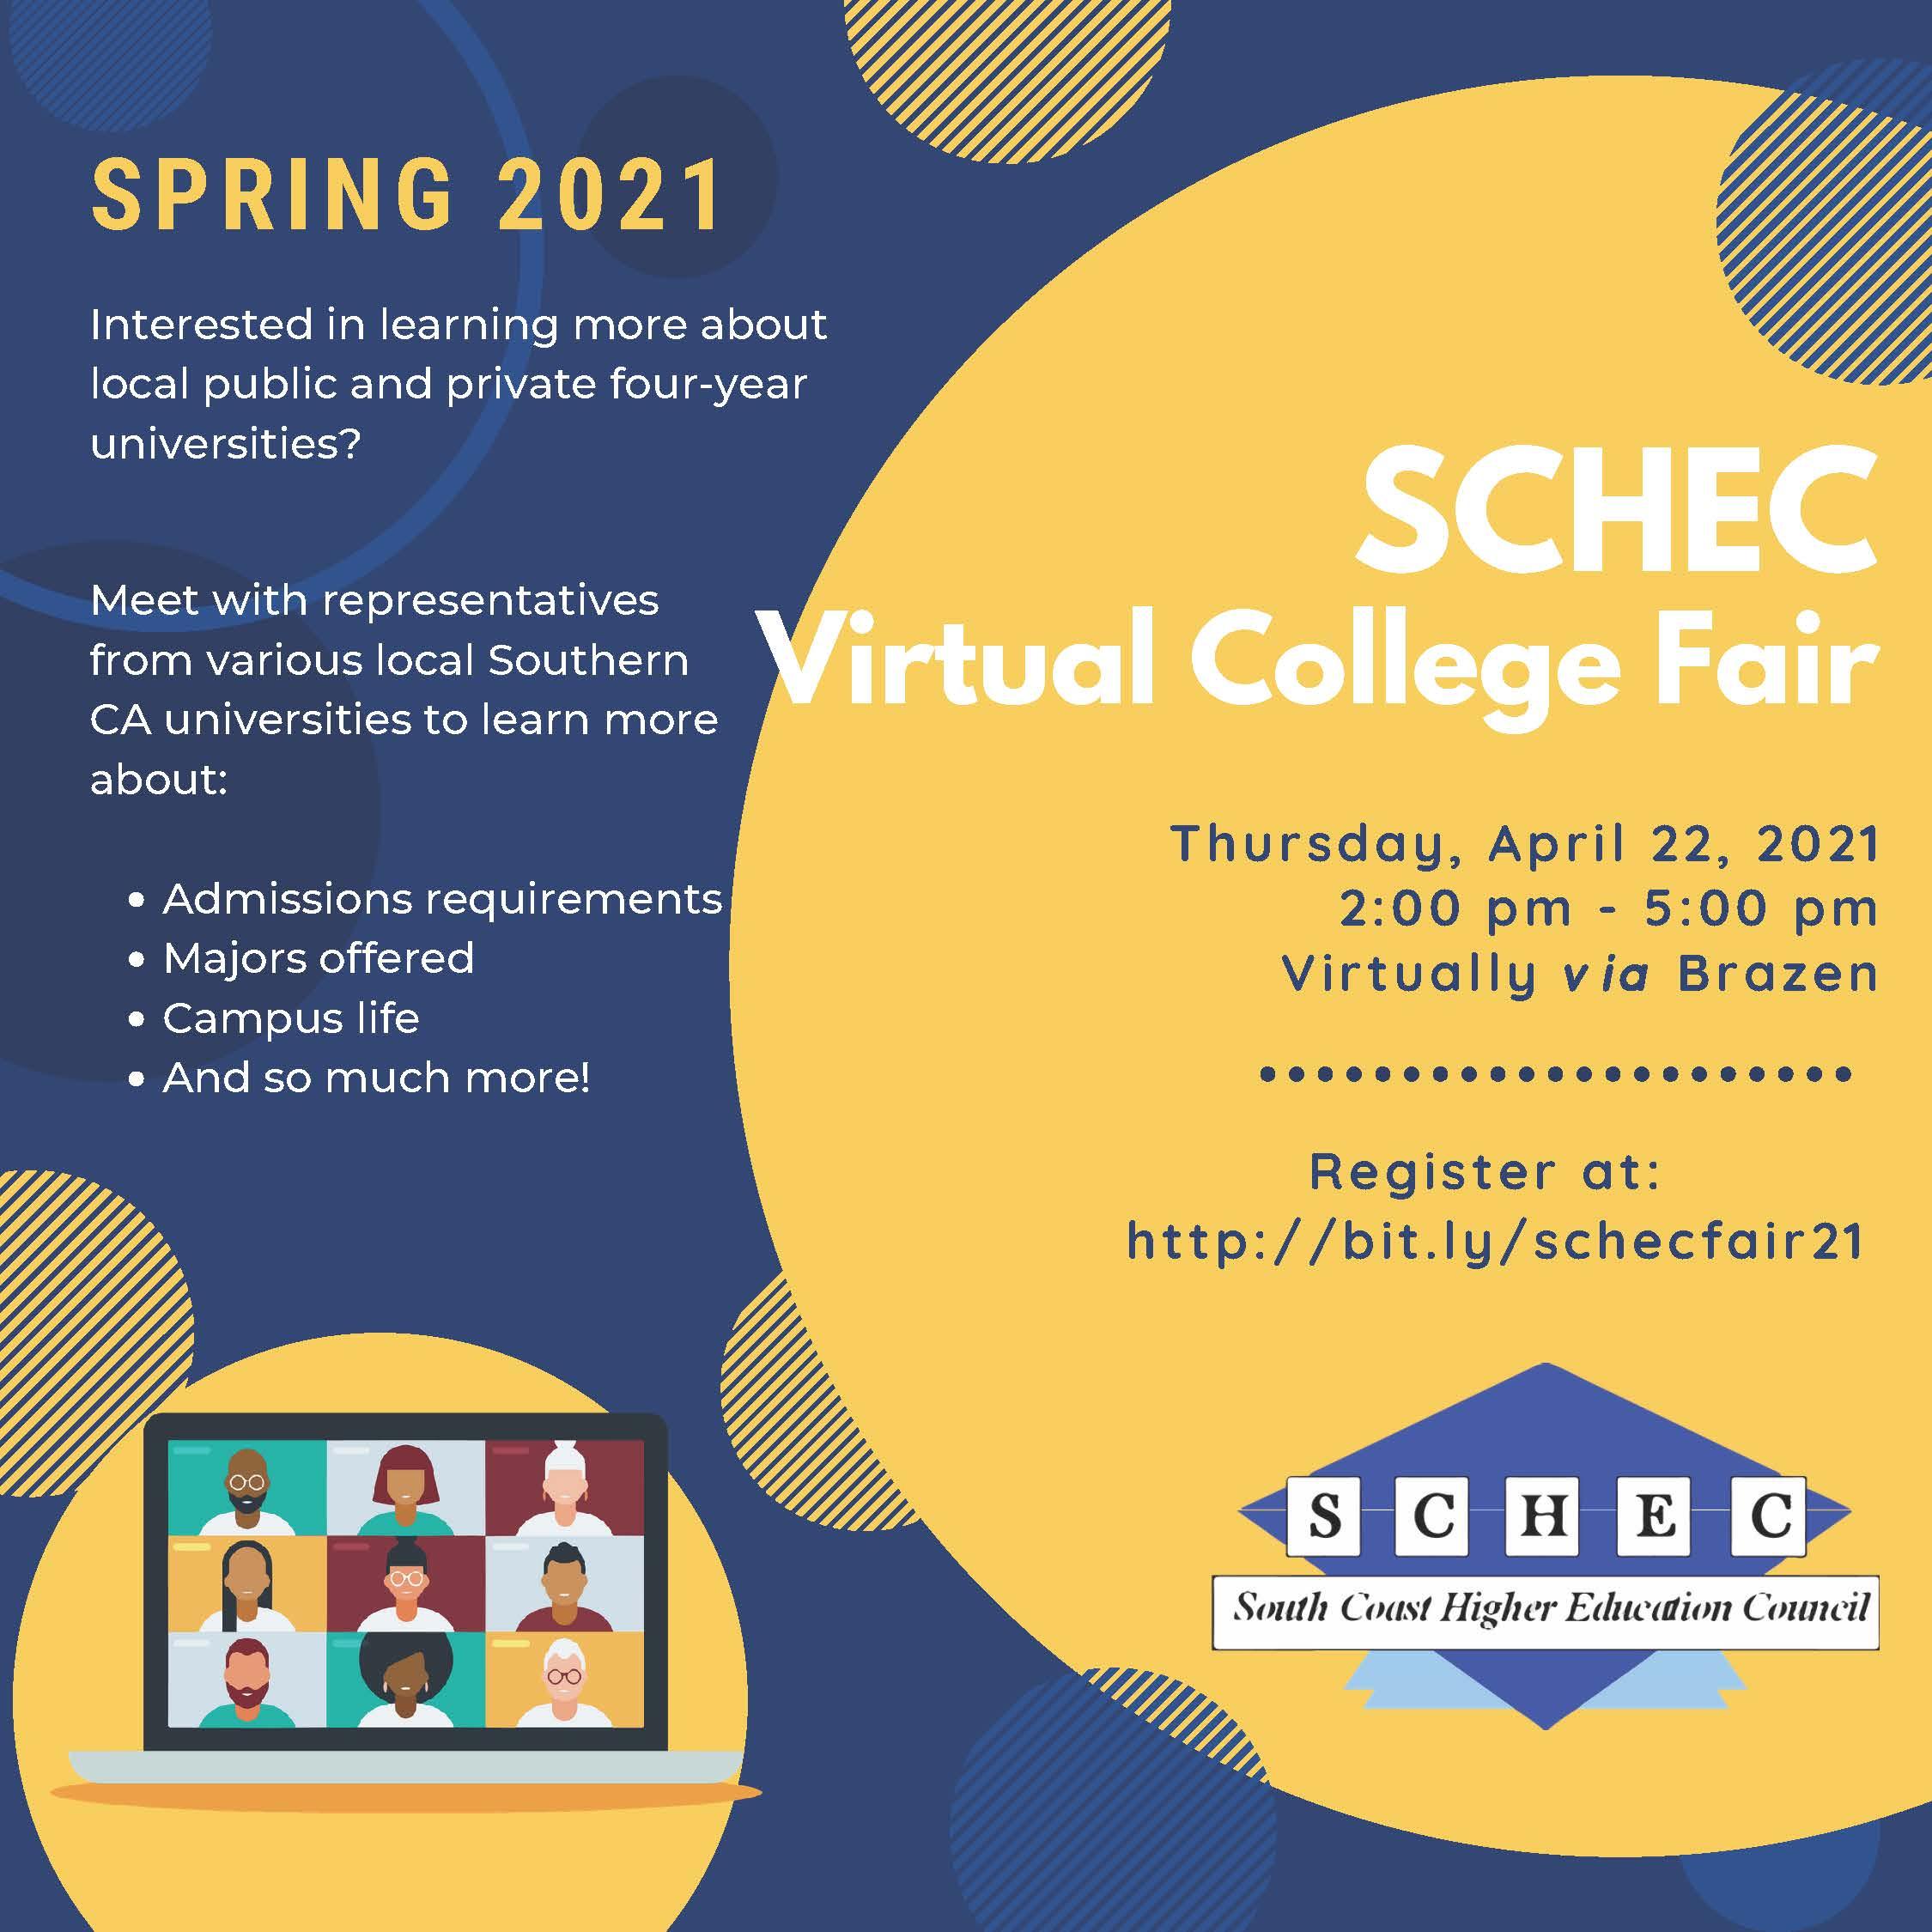 SCHEC Virtual College Fair - Cypress College